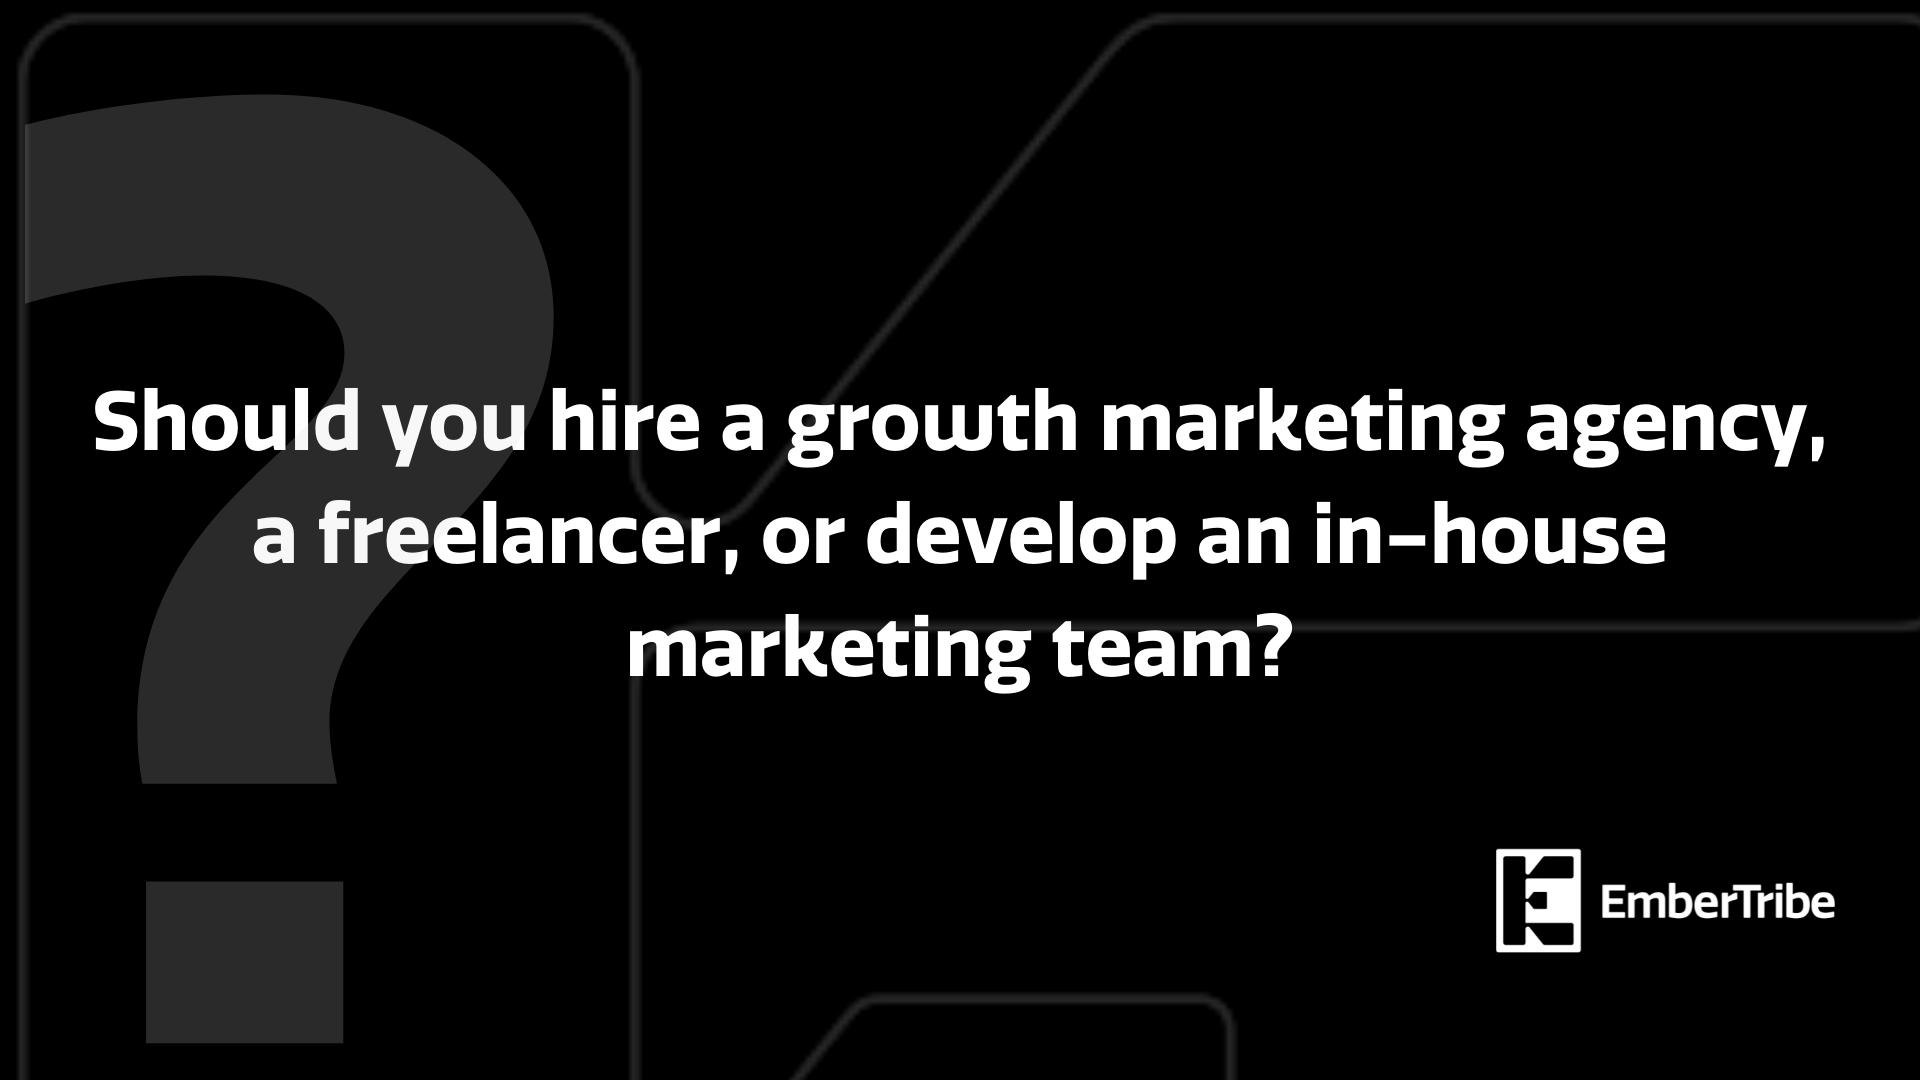 Choosing between an agency, freelancer, or in-house marketer